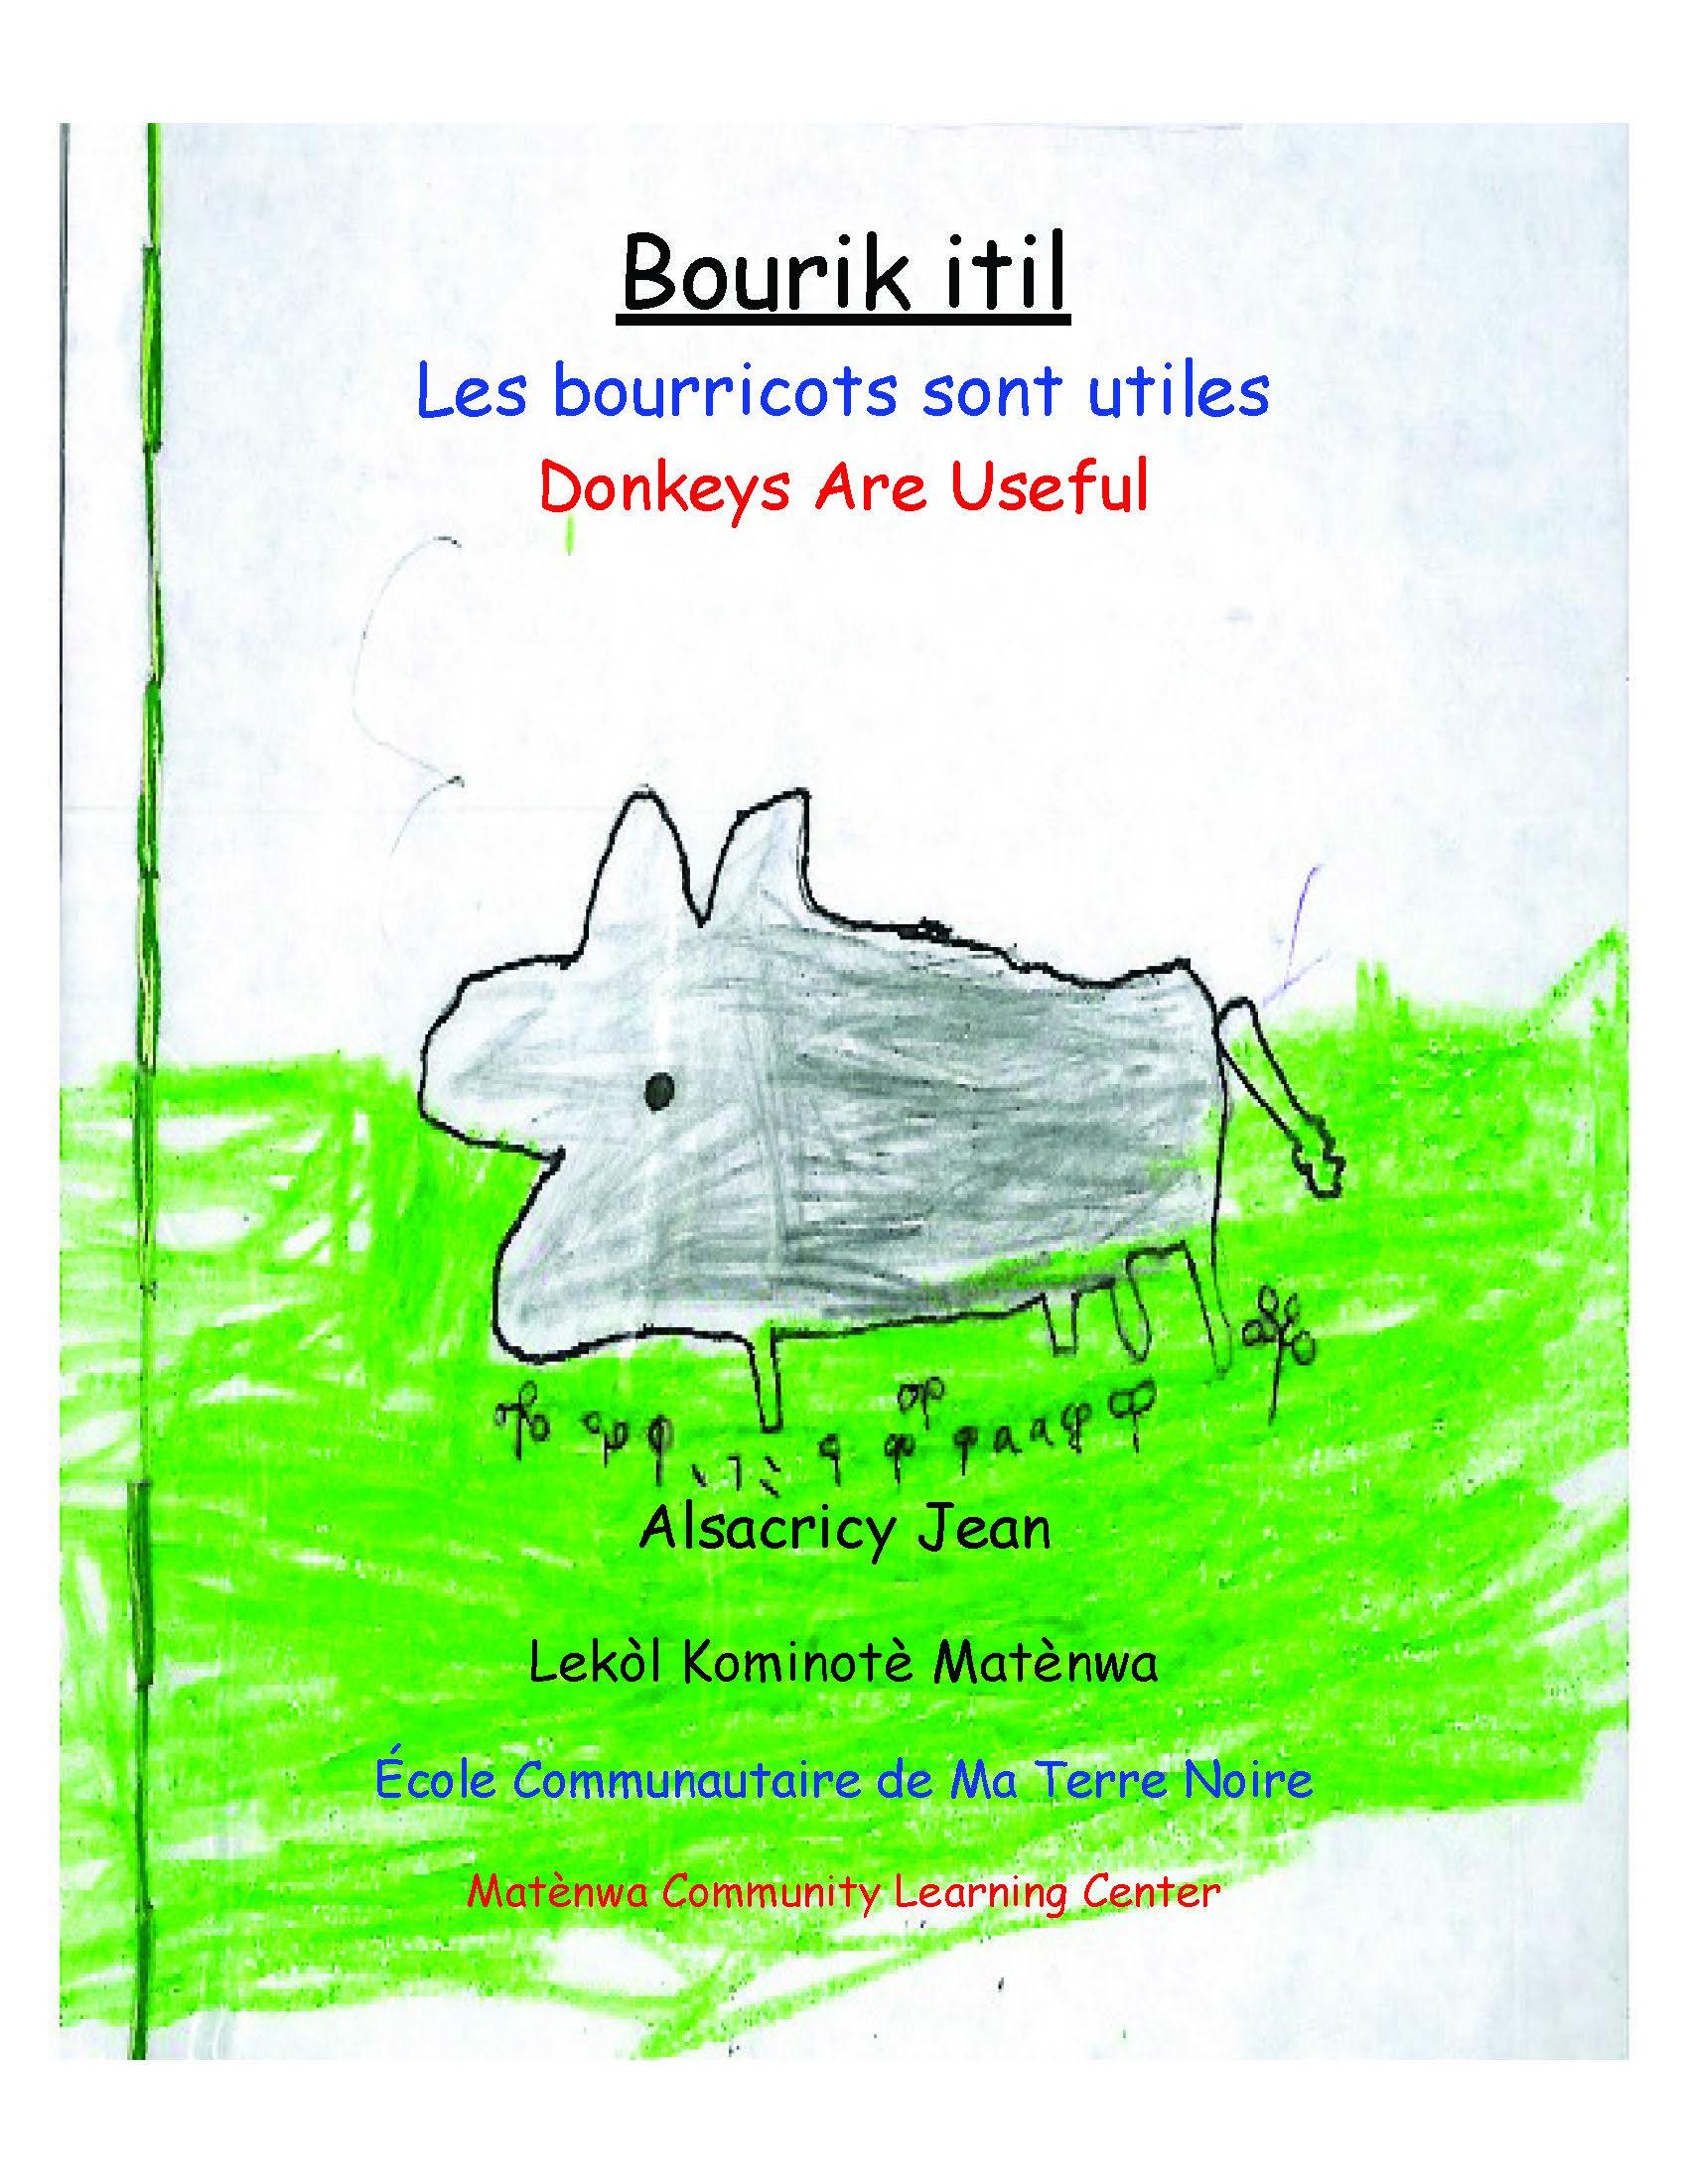 Bourik itil / Donkeys Are Useful